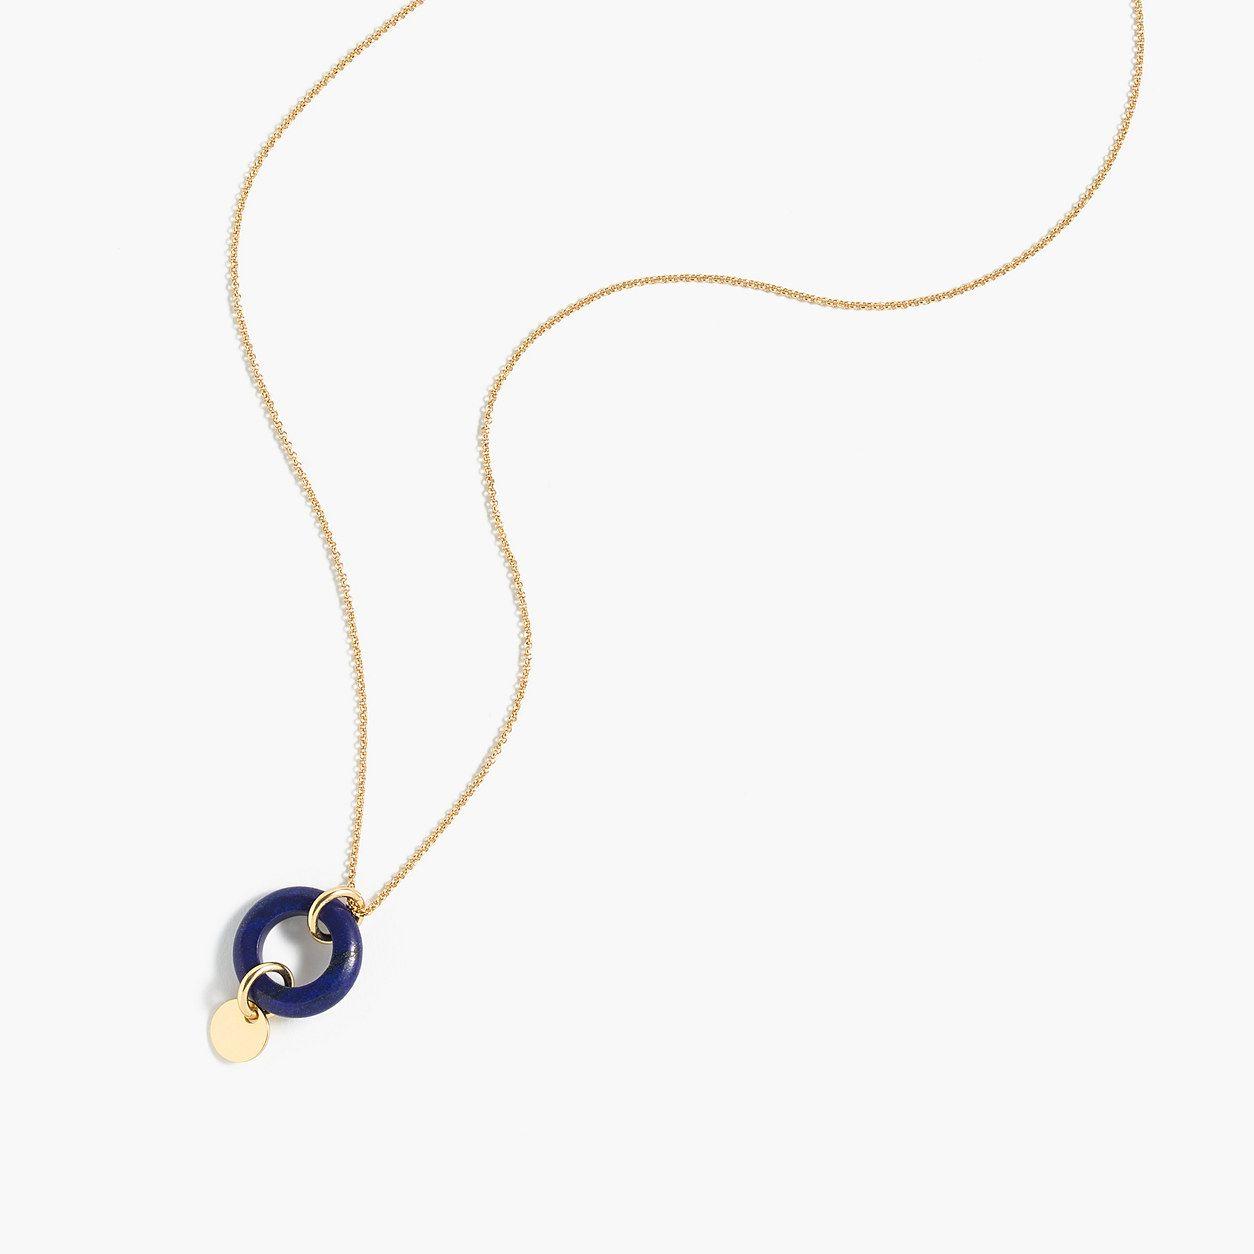 Jcrew womens circle pendant necklace jewelry ue charms u pendants